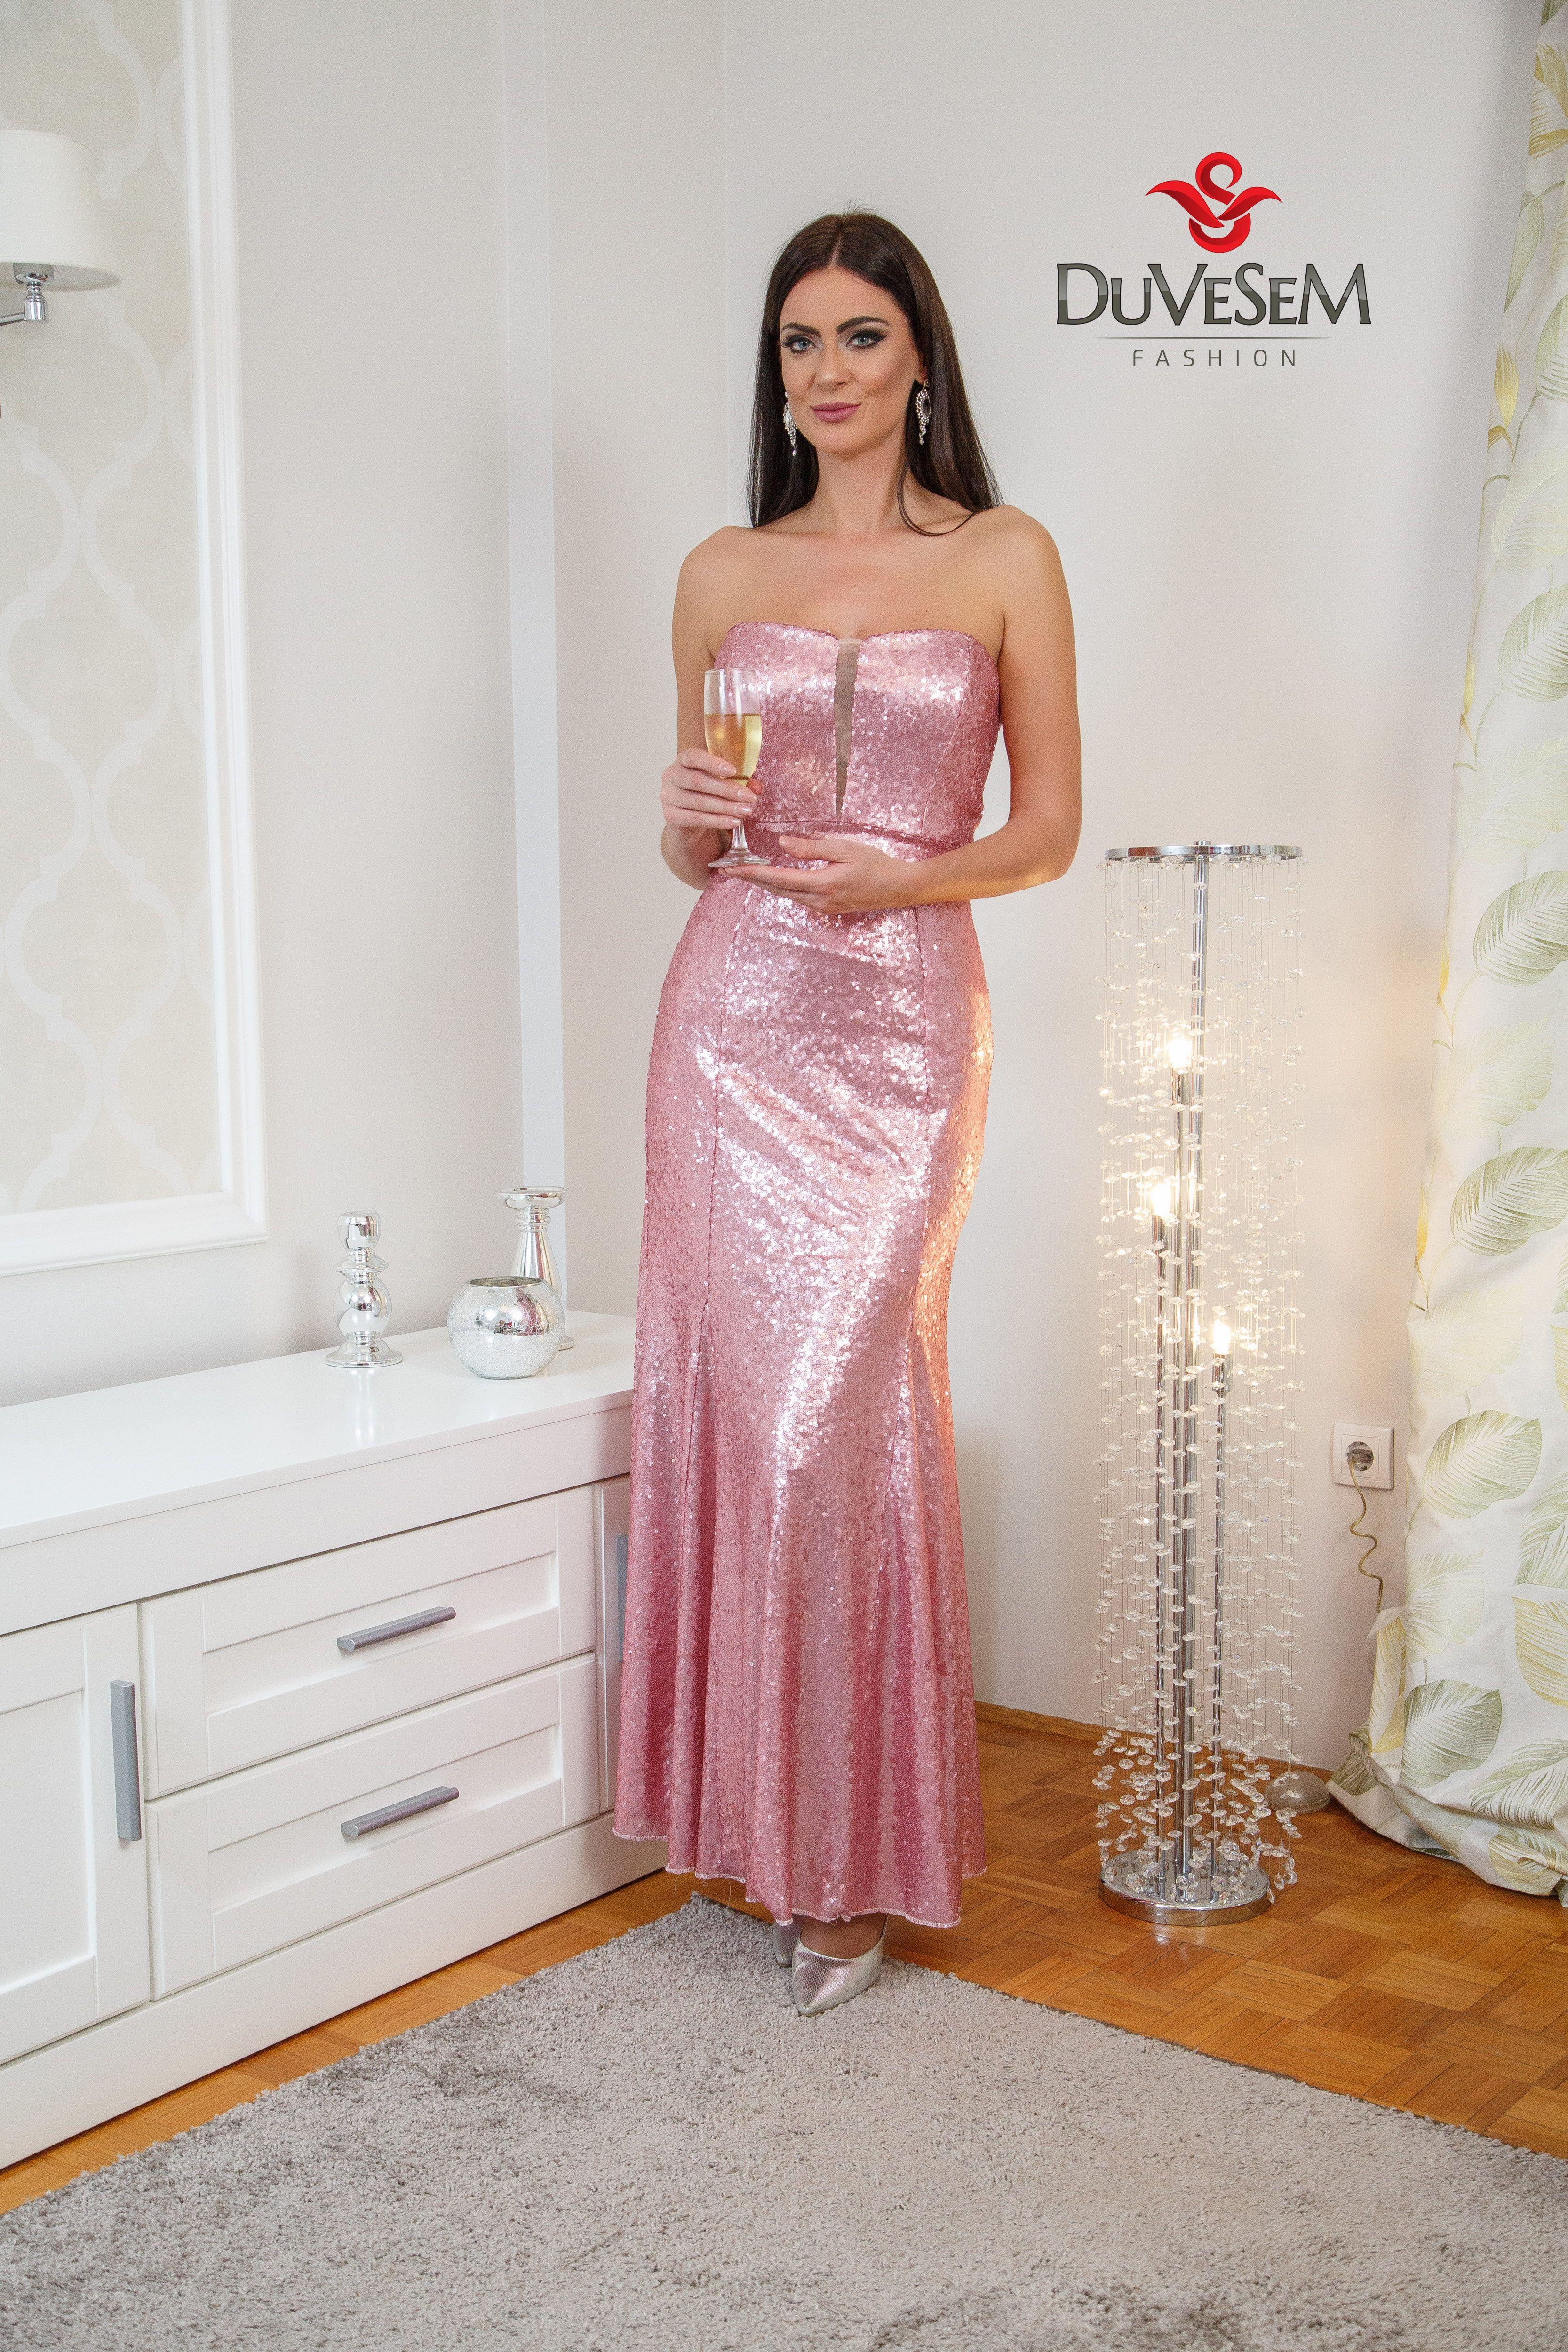 Malo Roze Boje Duvesem Fashion Rozahaljina Dugackahaljina